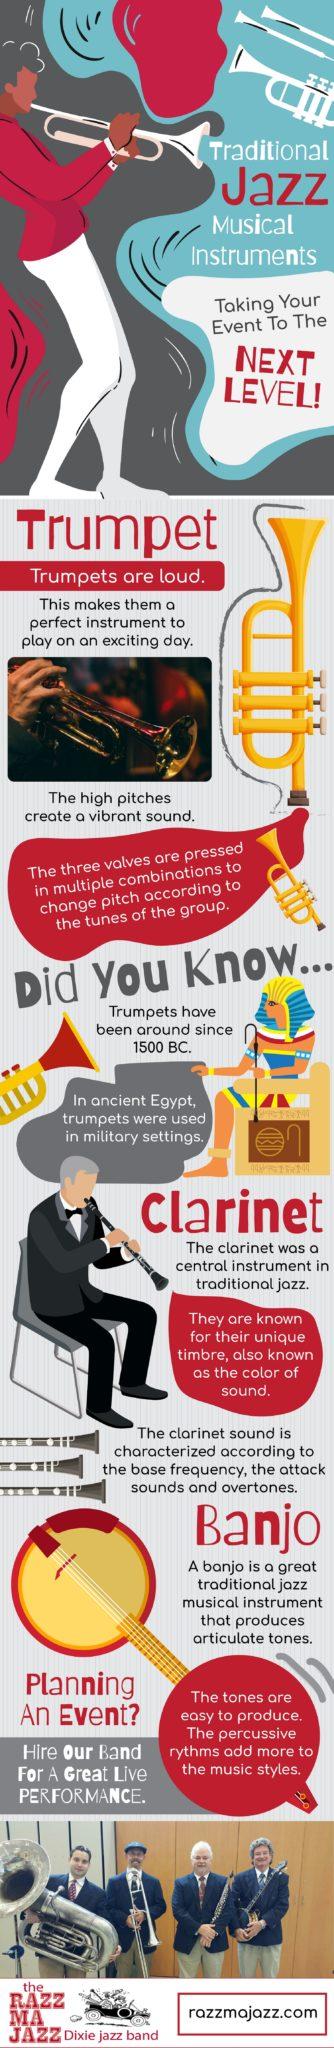 traditonal jazz musical instruments